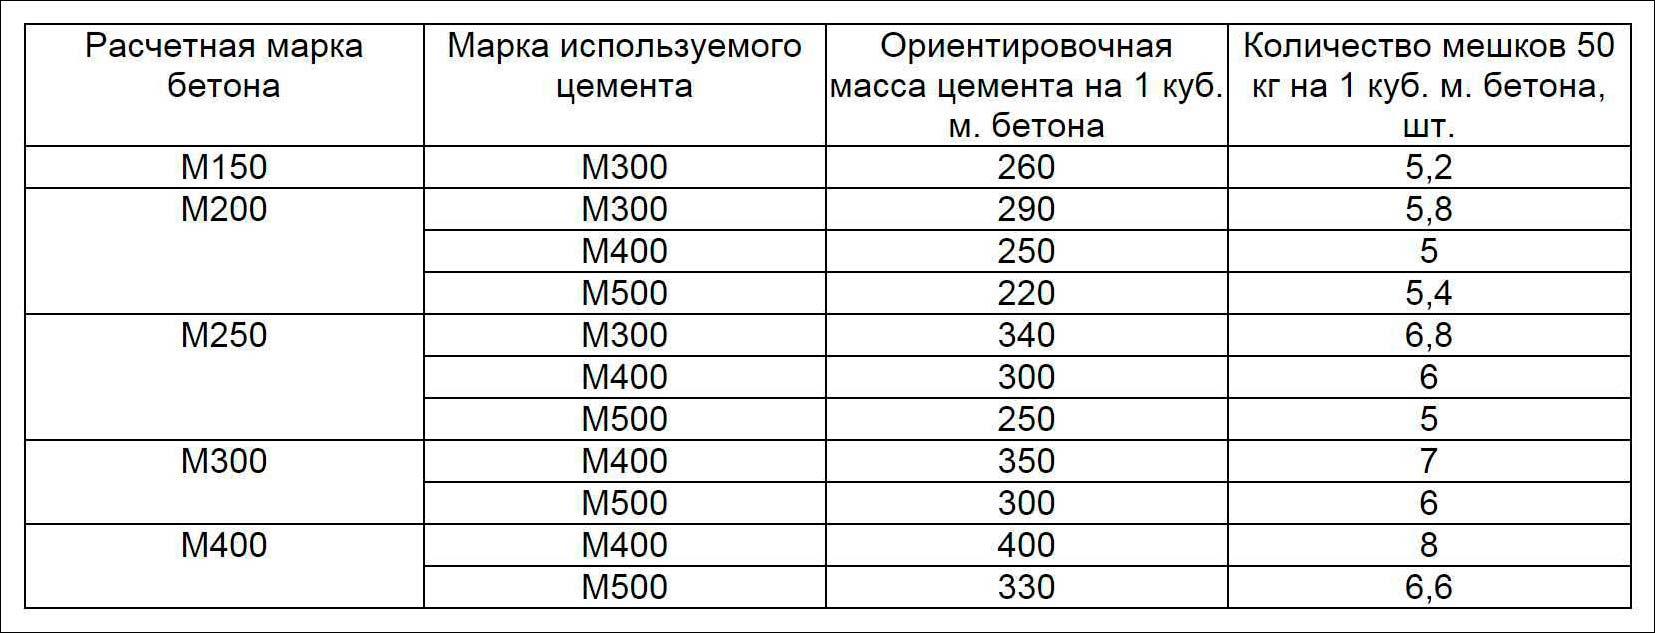 характеристики бетона таблица